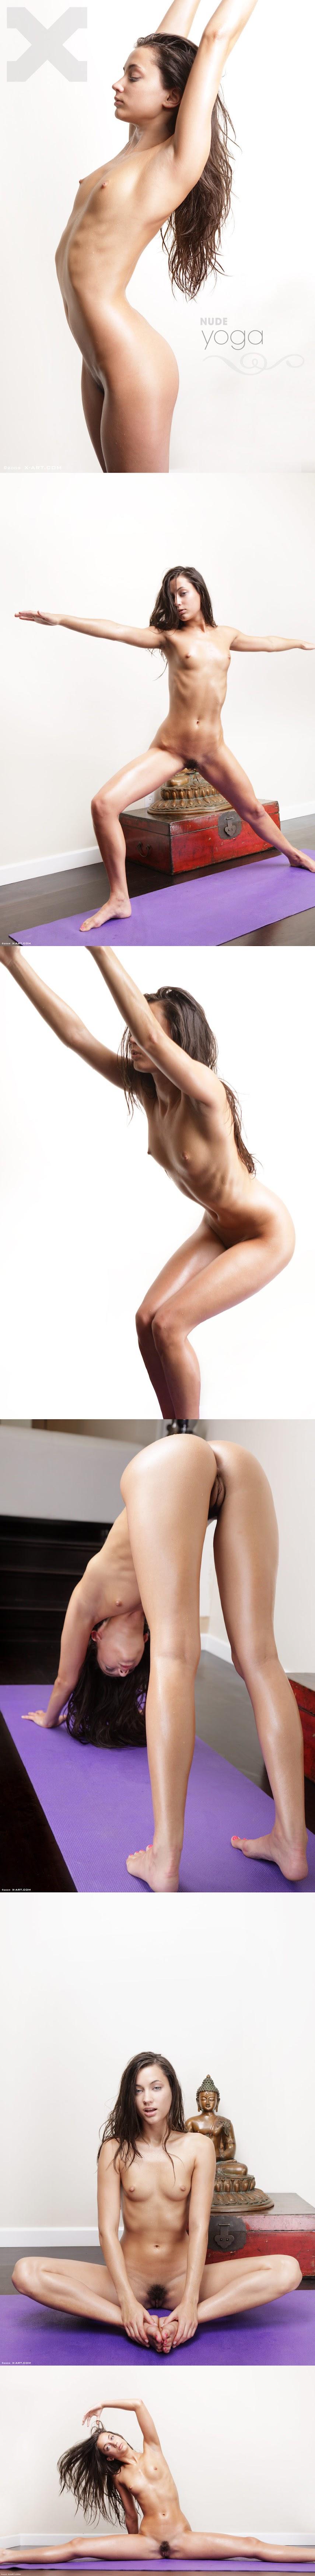 x-art georgia nude yoga-lrgReal Street Angels